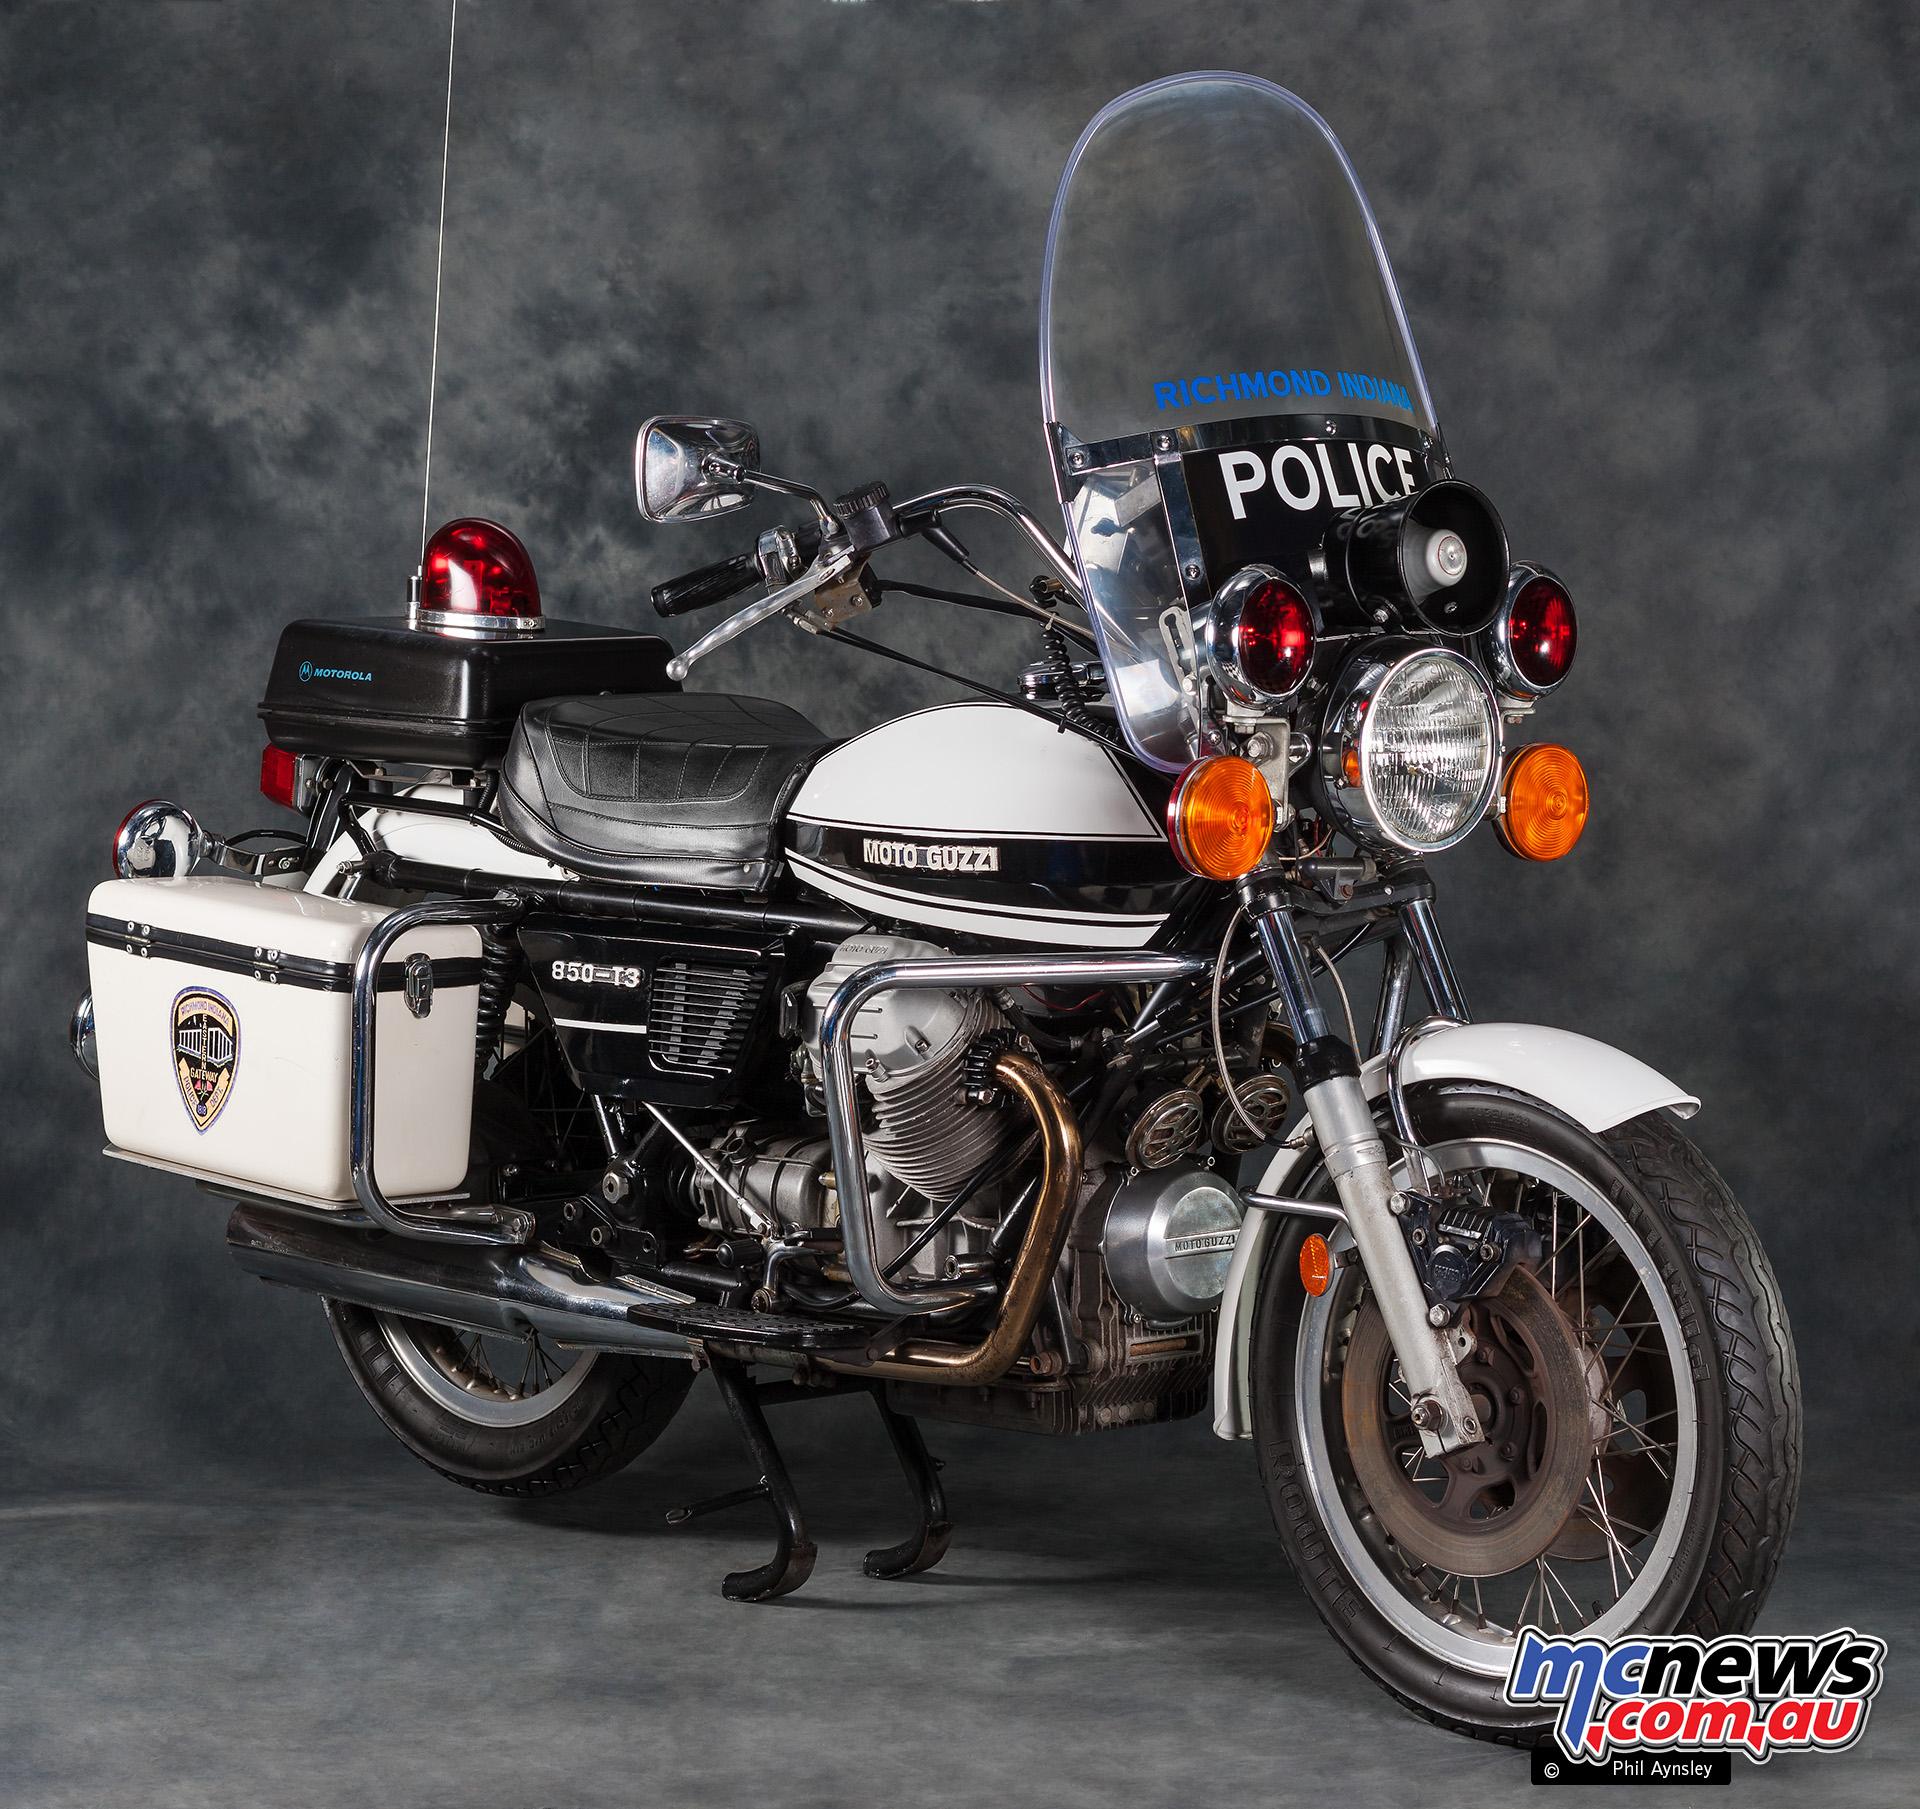 LAPD Moto Guzzi 850 T3 Police Bikes | MCNews.com.au